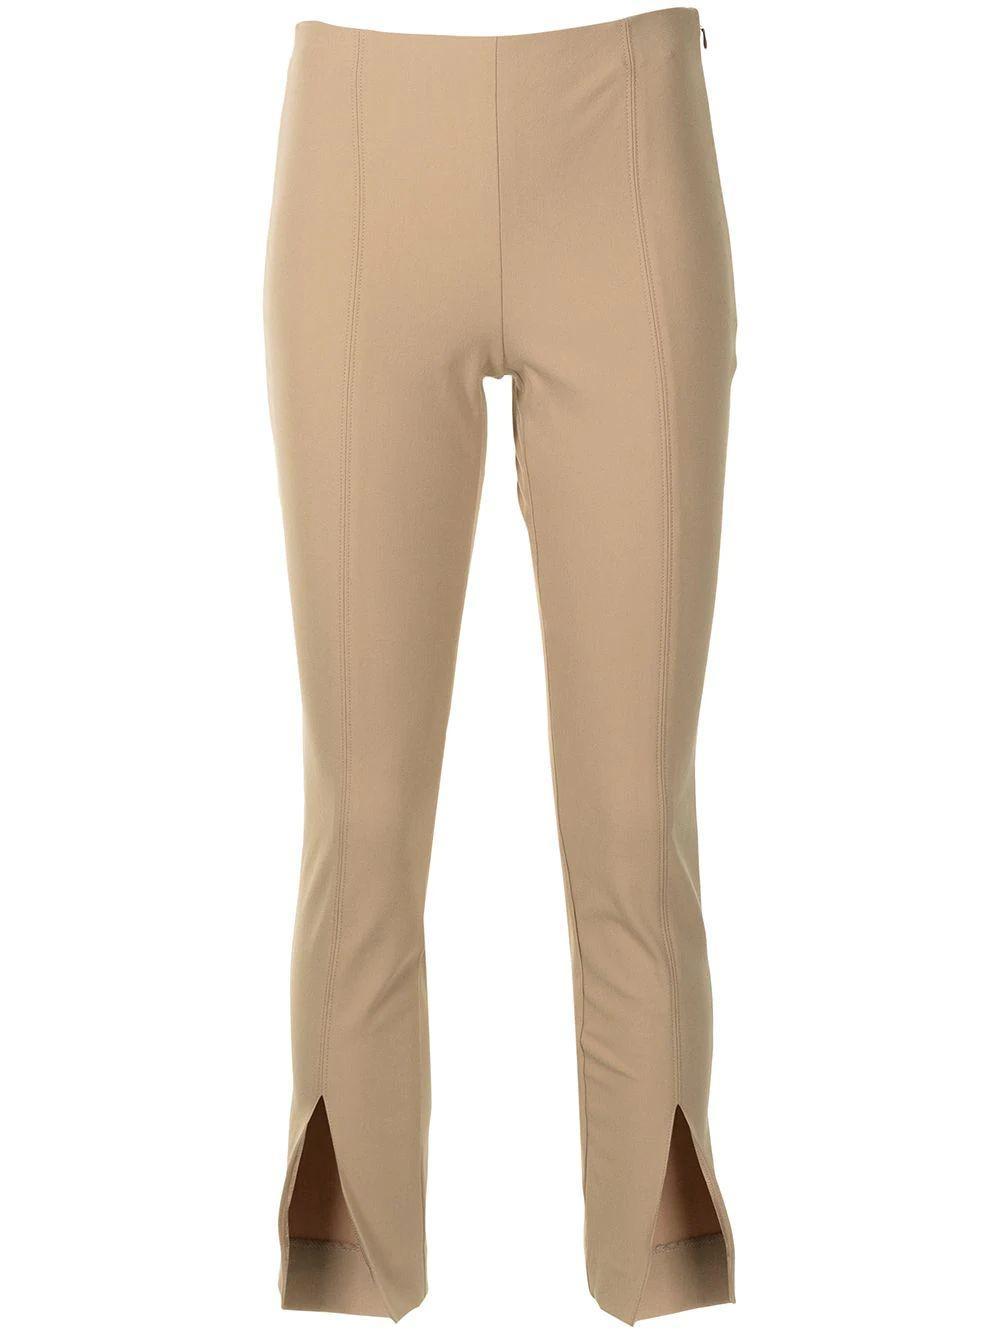 Slit Front Side Zip Pant